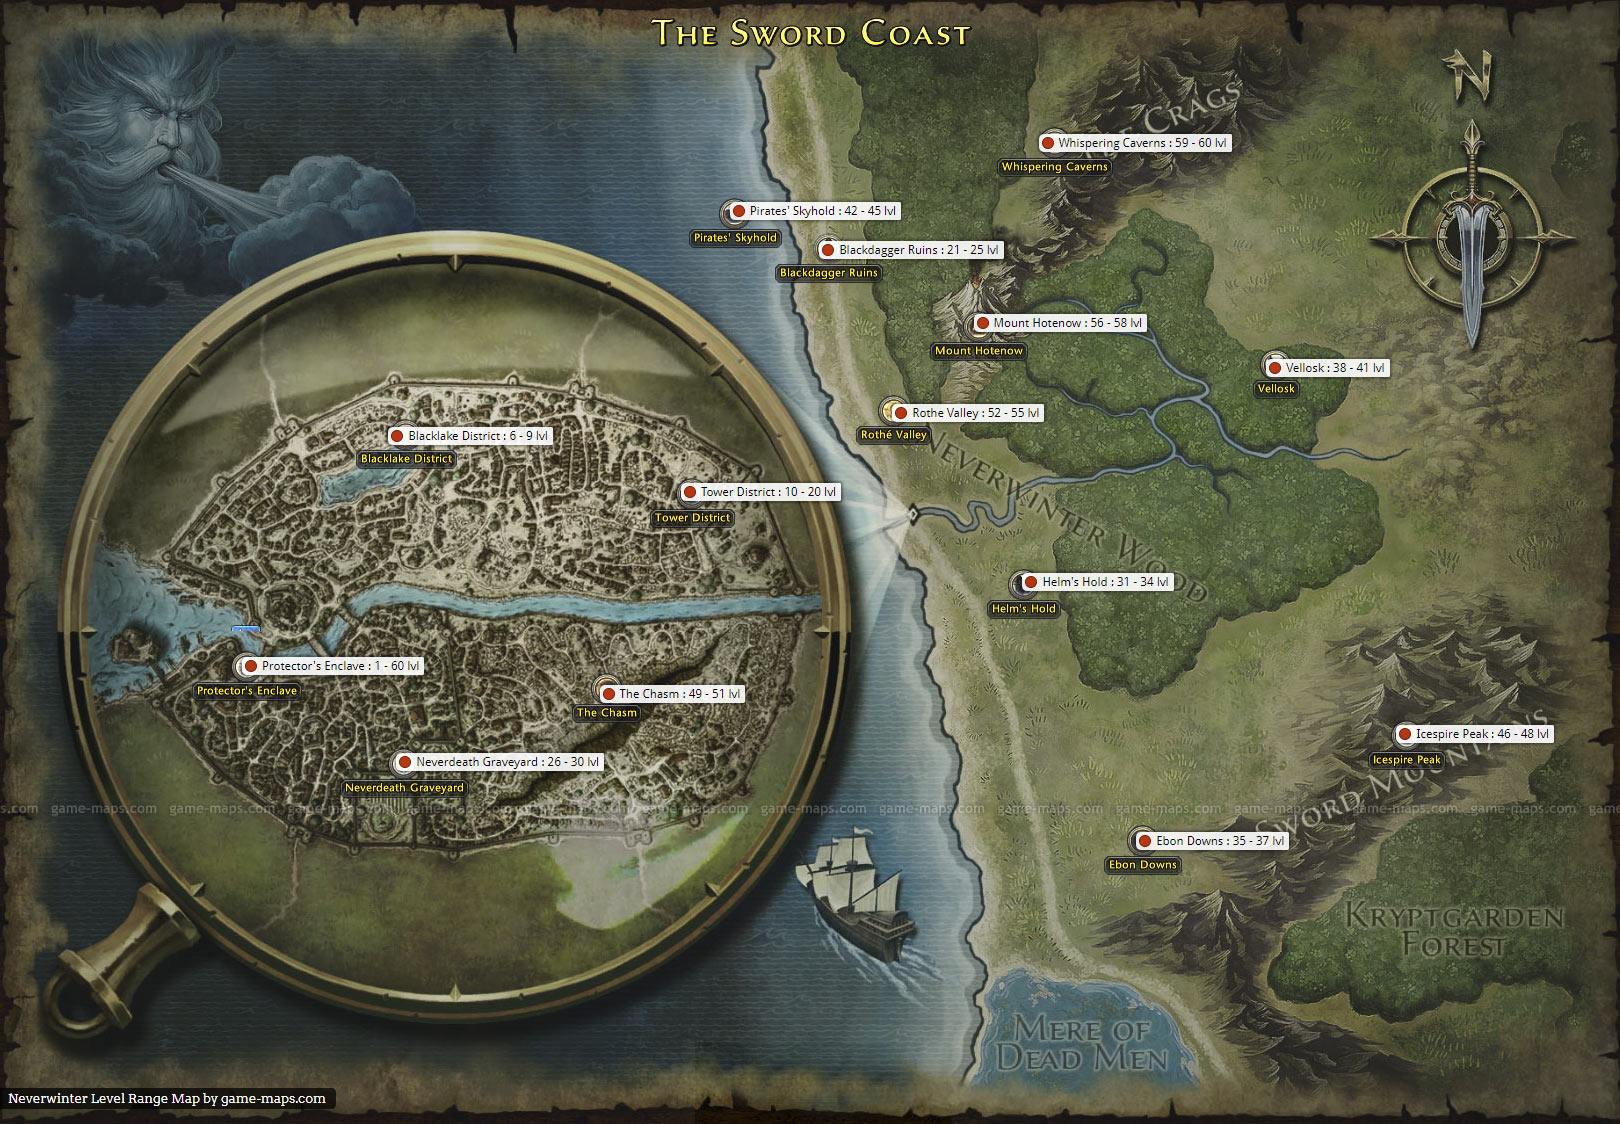 Neverwinter Level Range Map   game-maps.com on